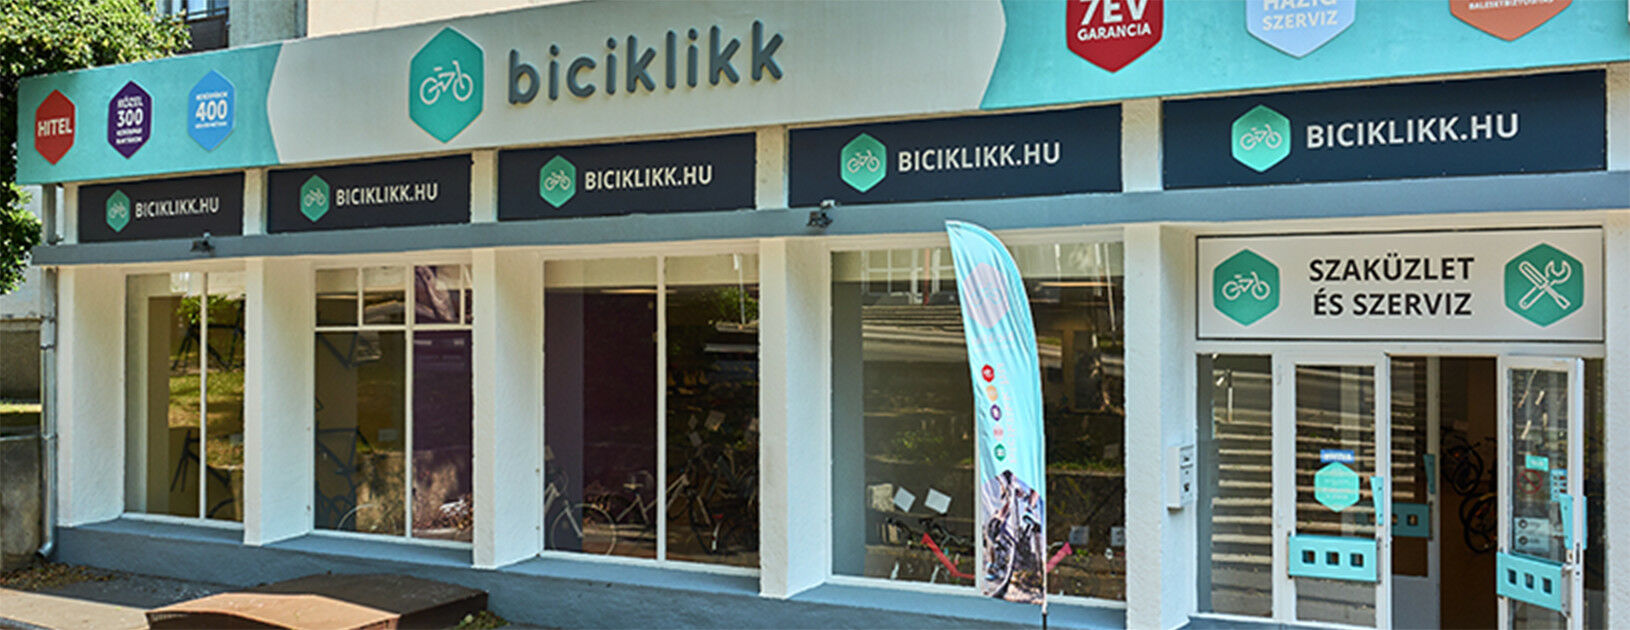 Biciklikk Pécs